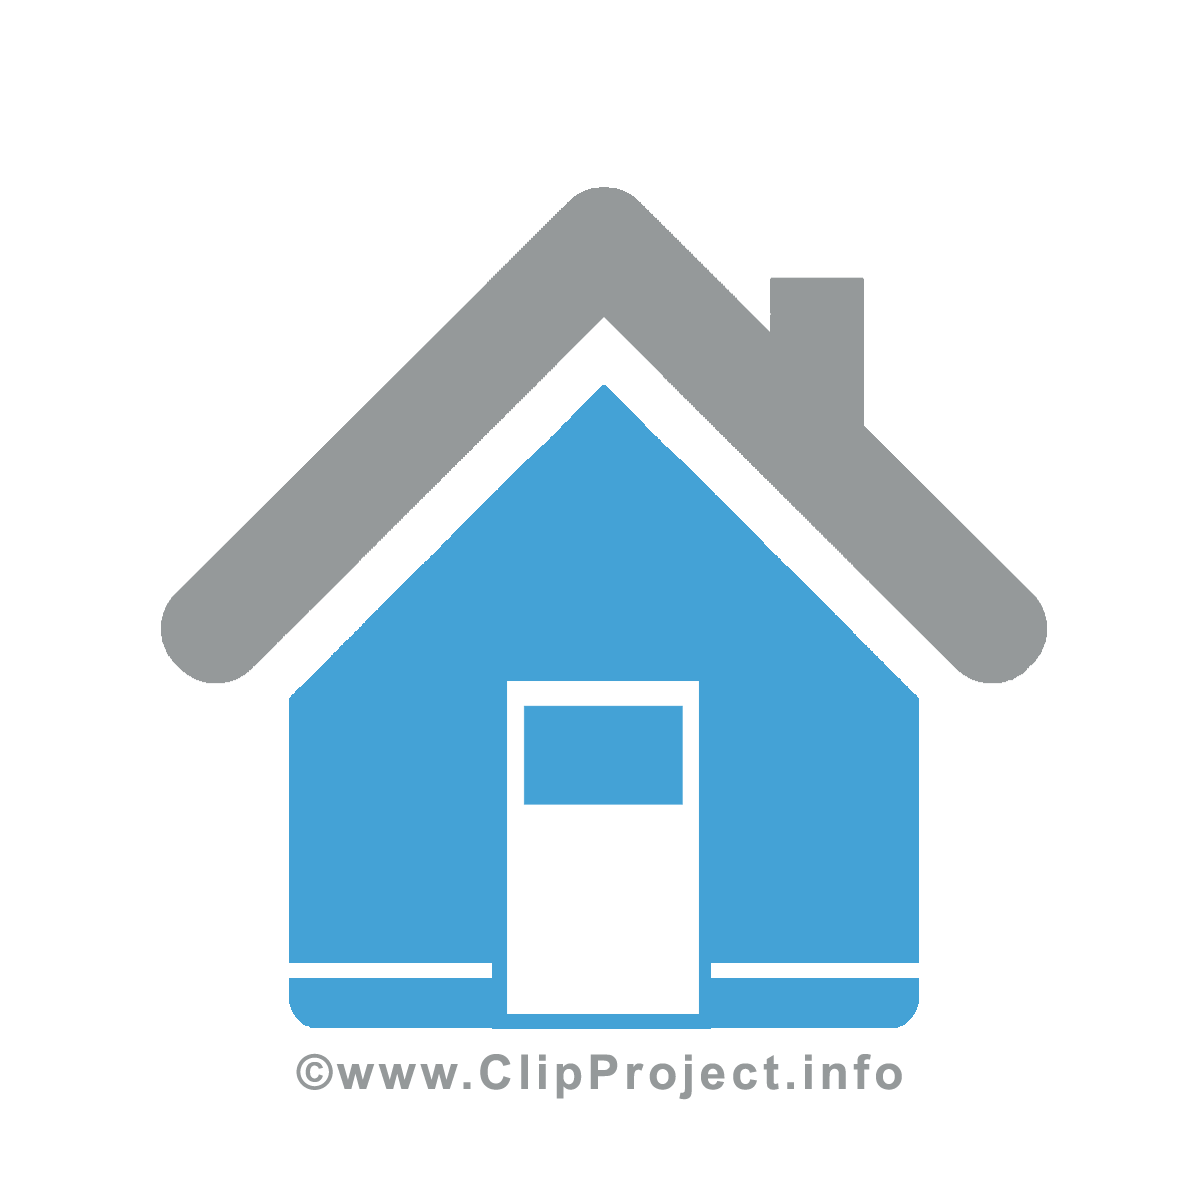 Bilder haus clipart clipart royalty free stock Haus Clipart-Bild kostenlos clipart royalty free stock